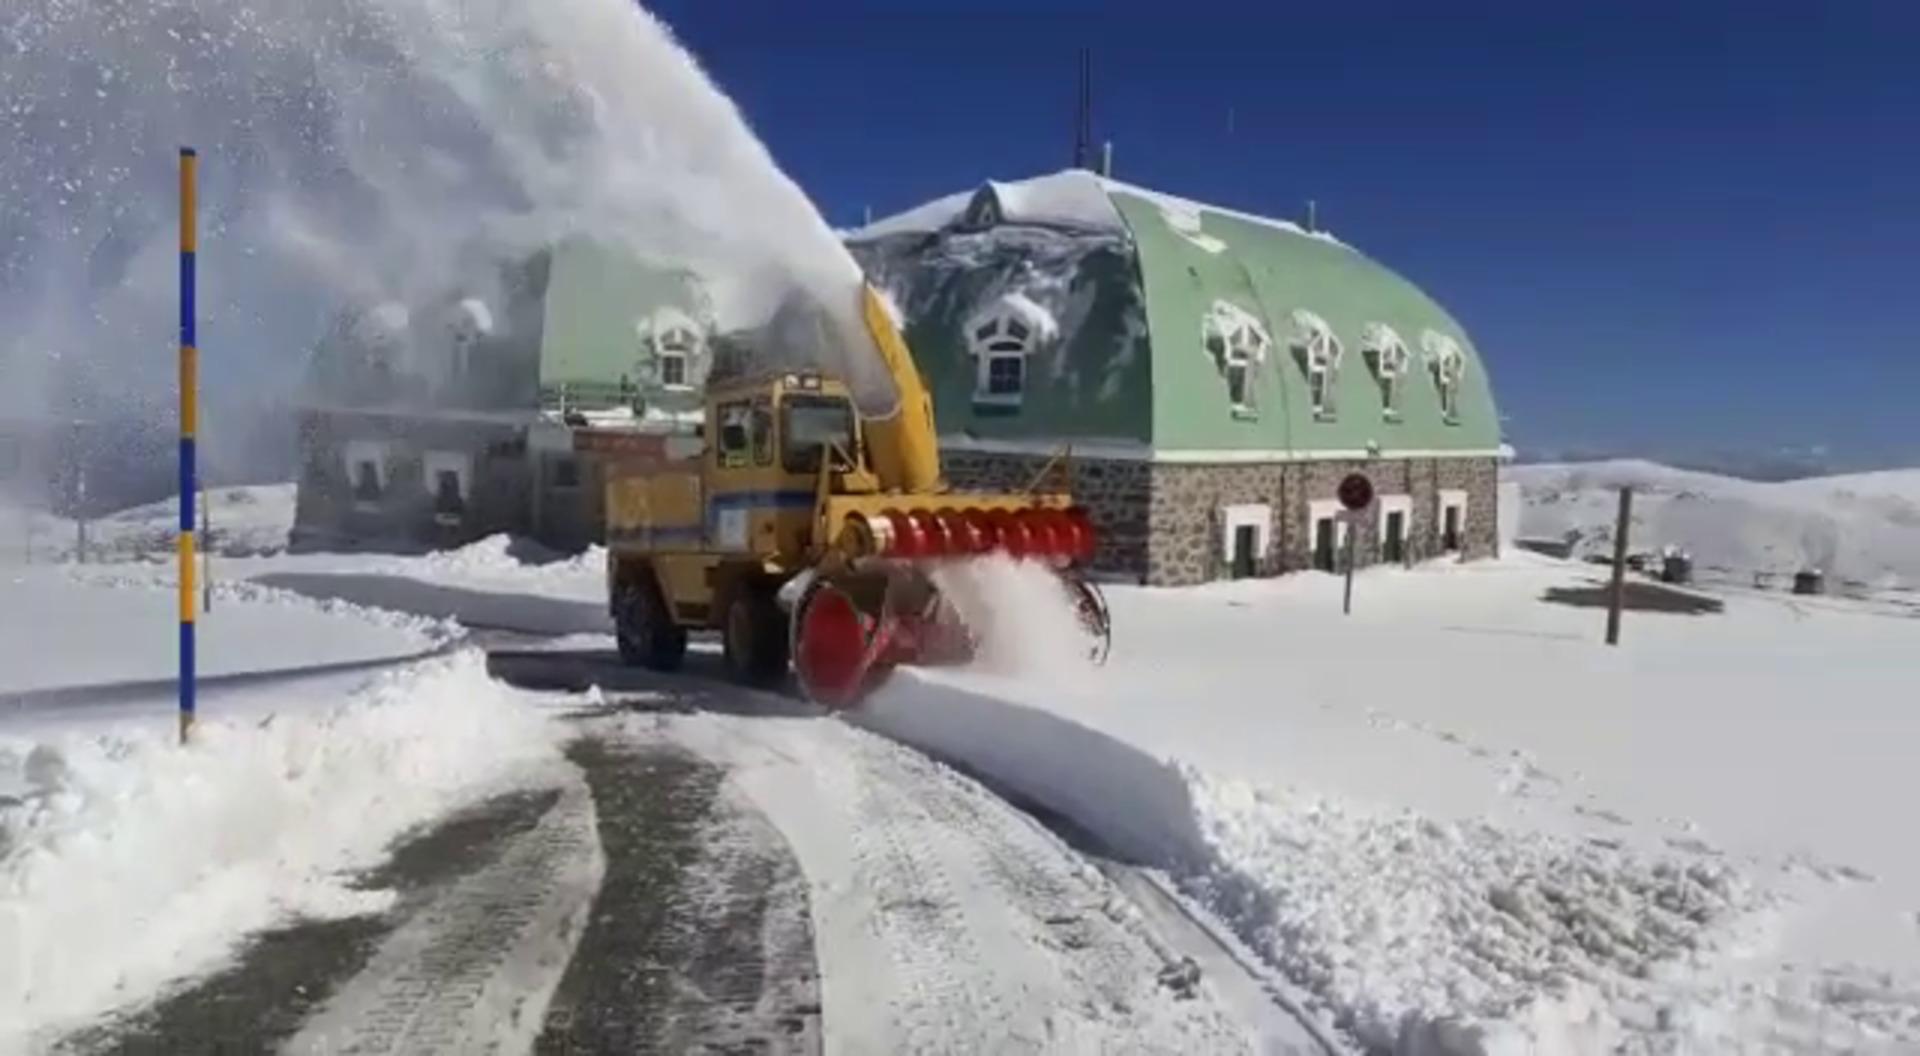 Máquina quitanieves despeja la carretera de la Hoya de la Mora en Sierra Nevada